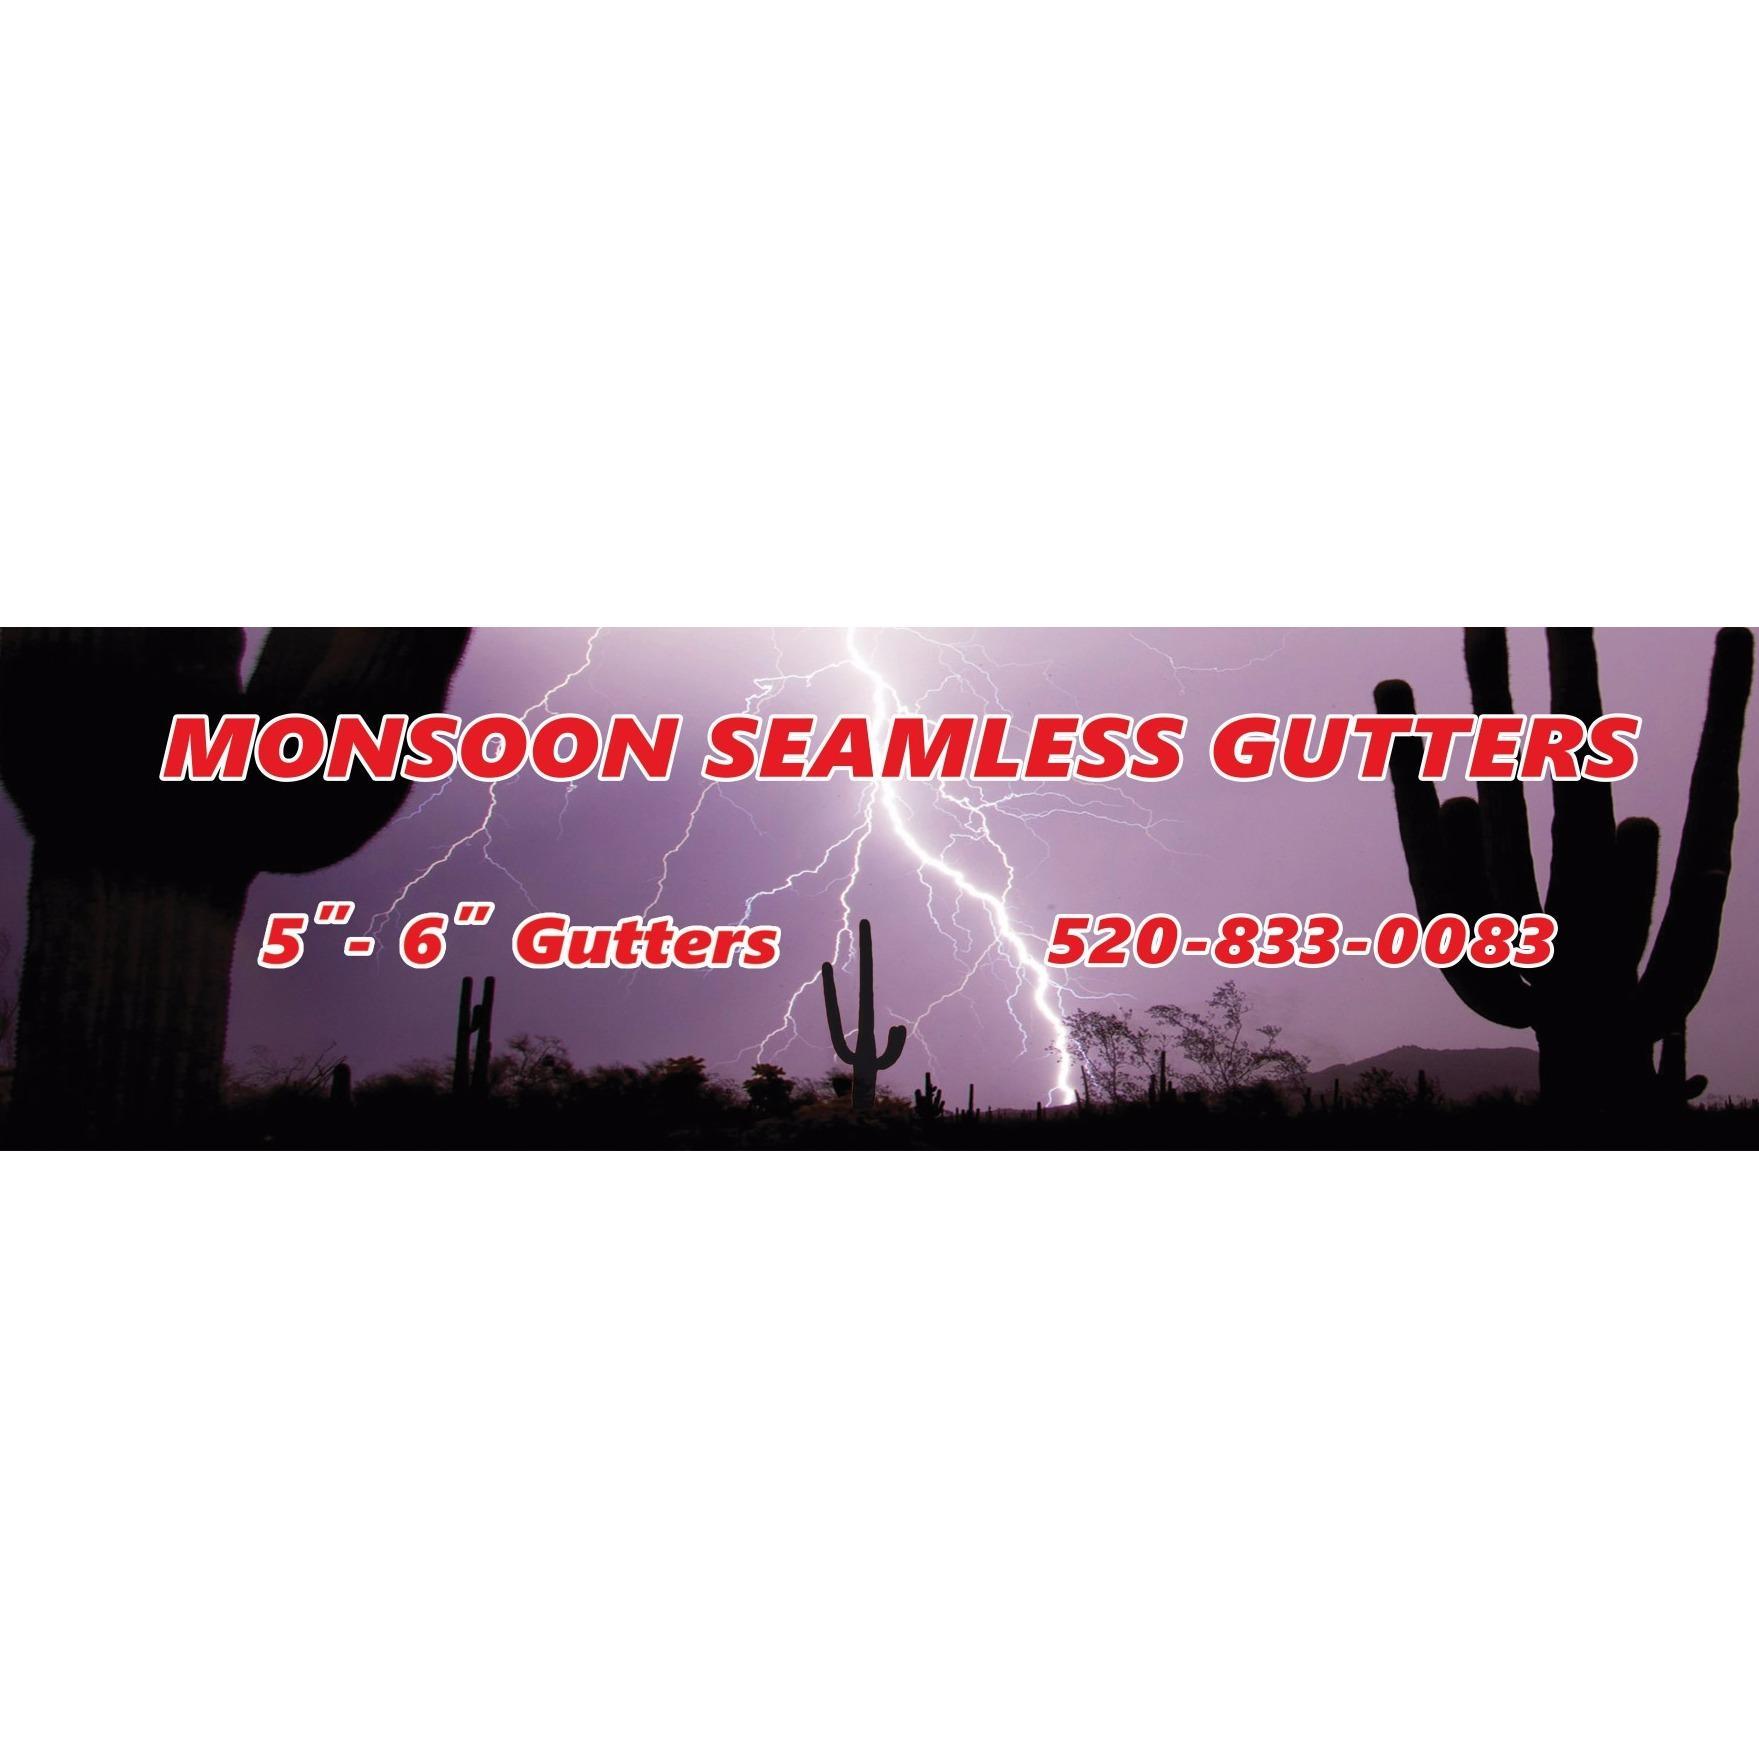 Monsoon Seamless Gutters